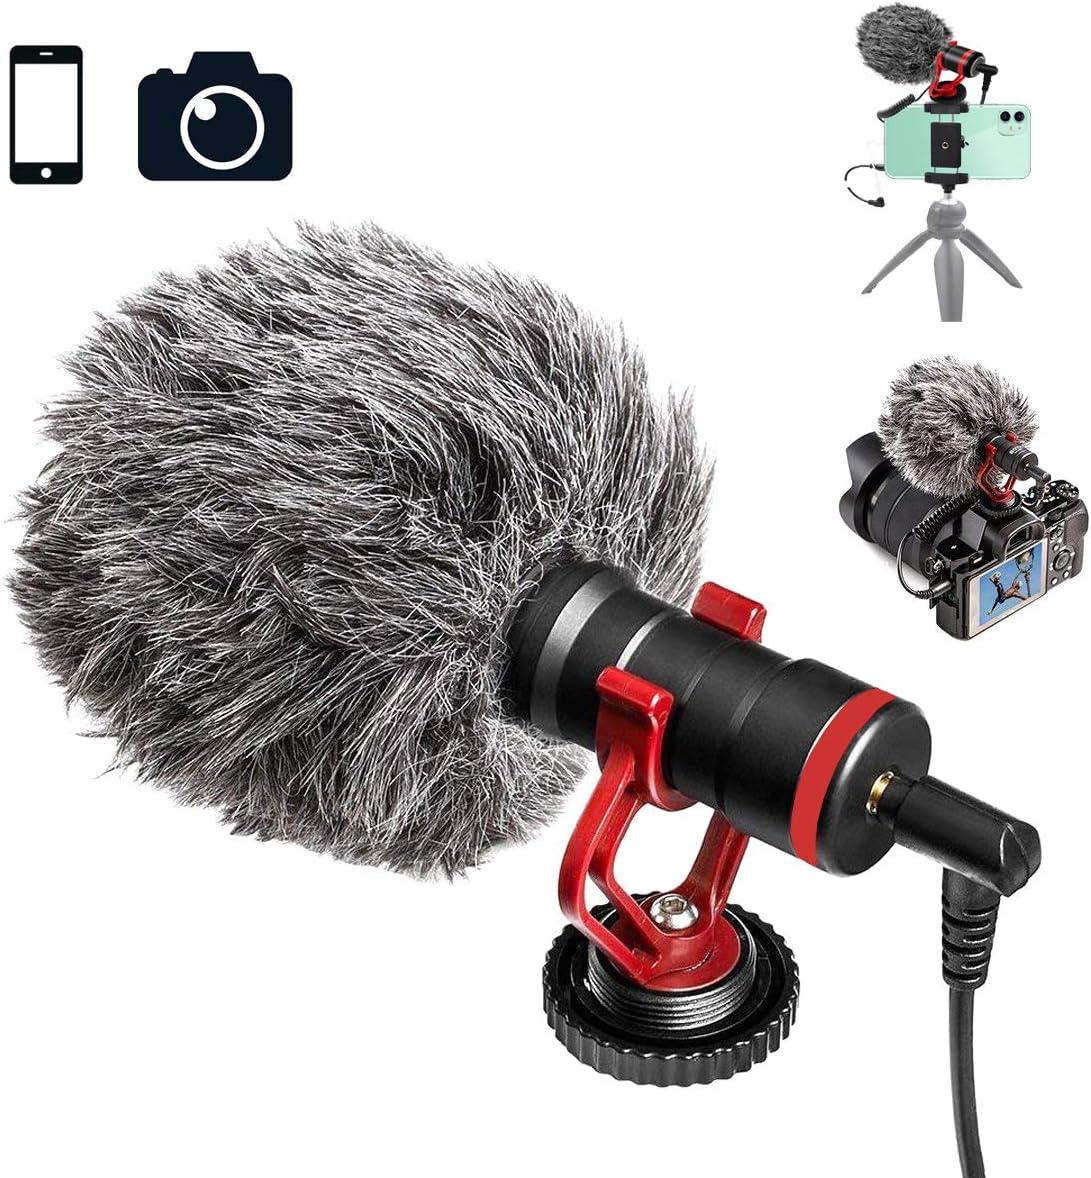 Tikysky Kameramikrofon Videomikrofon Sony iPhone DSLR kompatibel ...